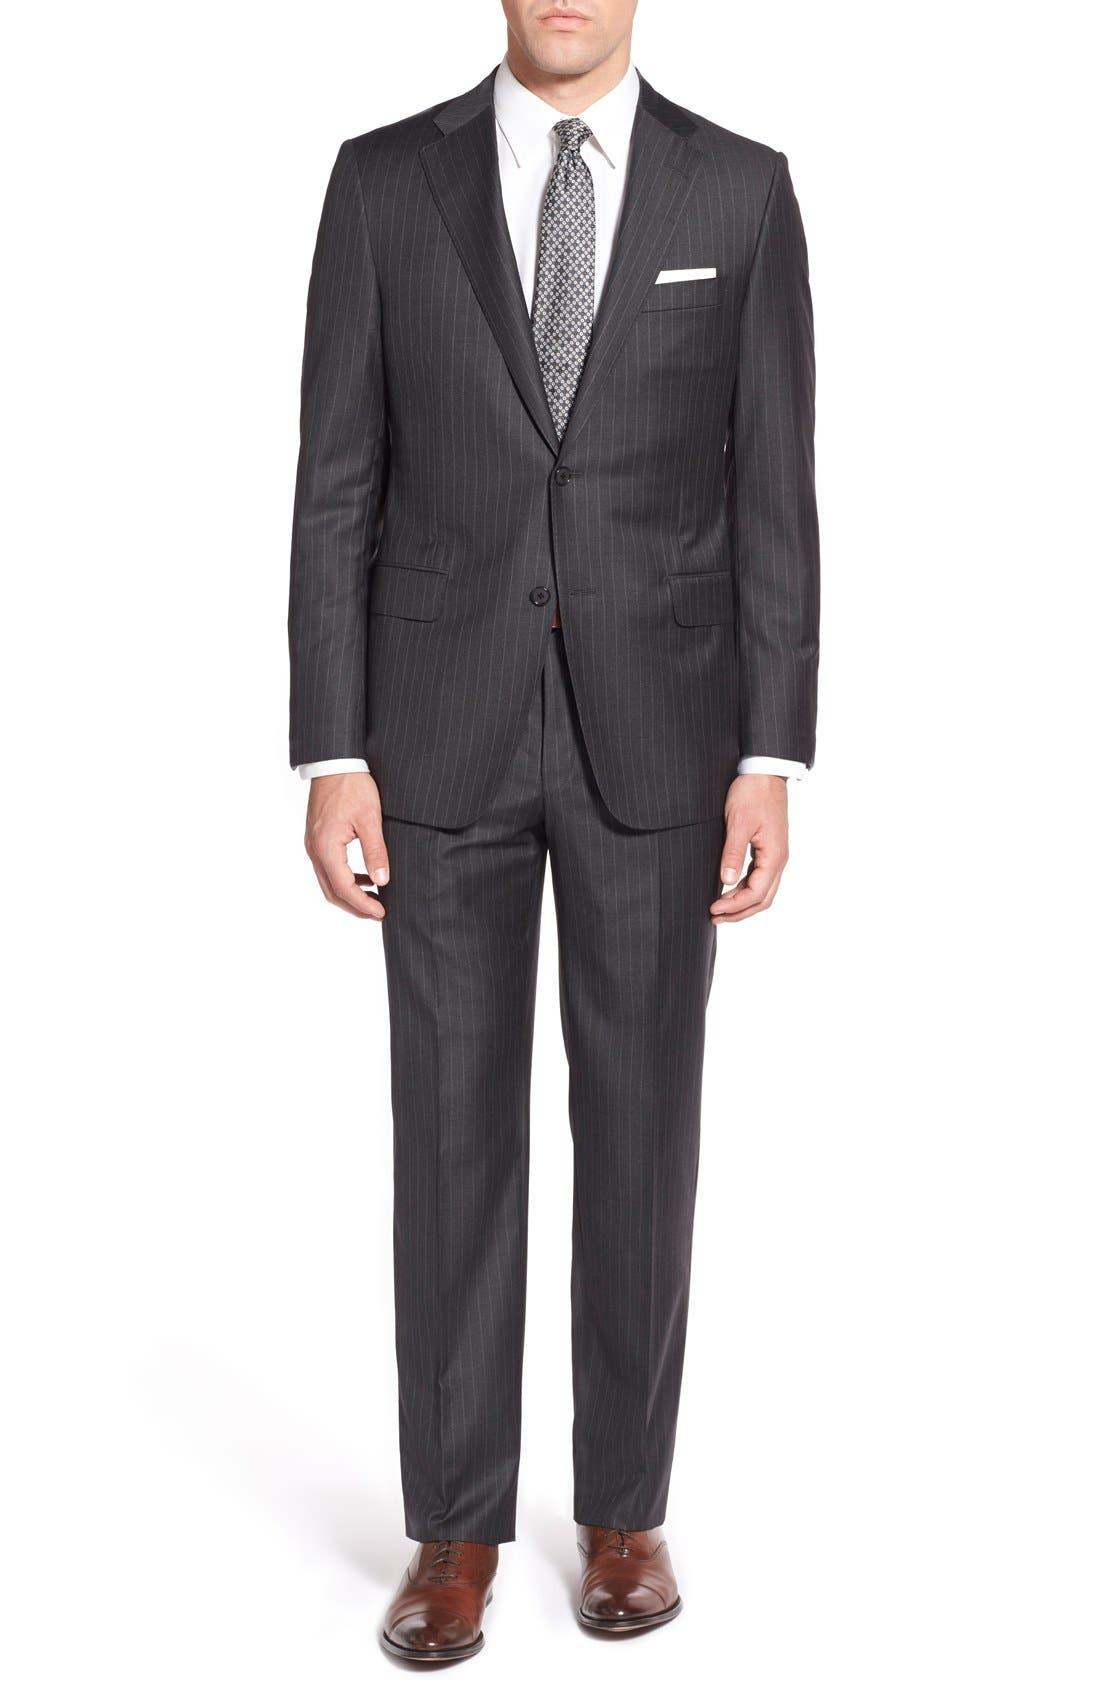 HICKEY FREEMAN Beacon - B Series Classic Fit Stripe Wool Suit